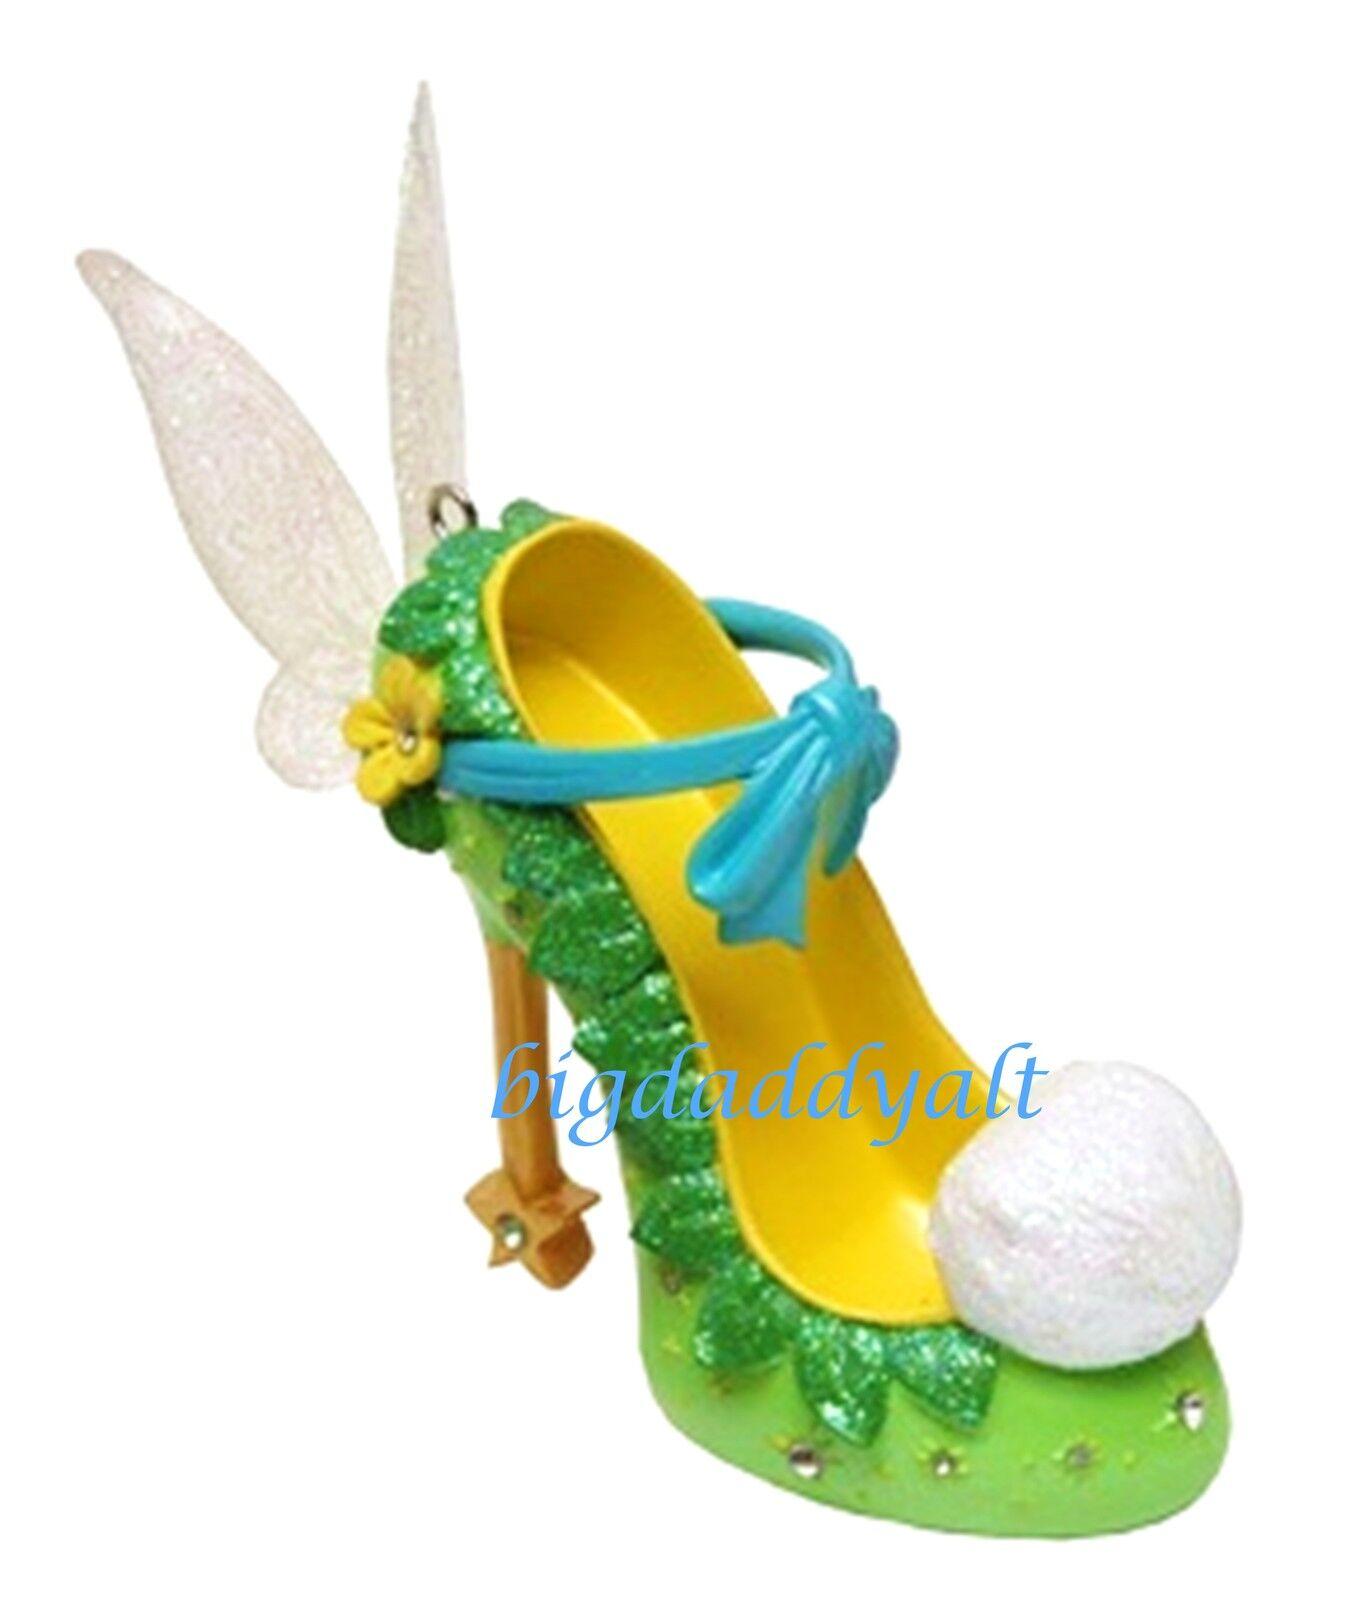 New disney parks tinker bell runway shoe ornament